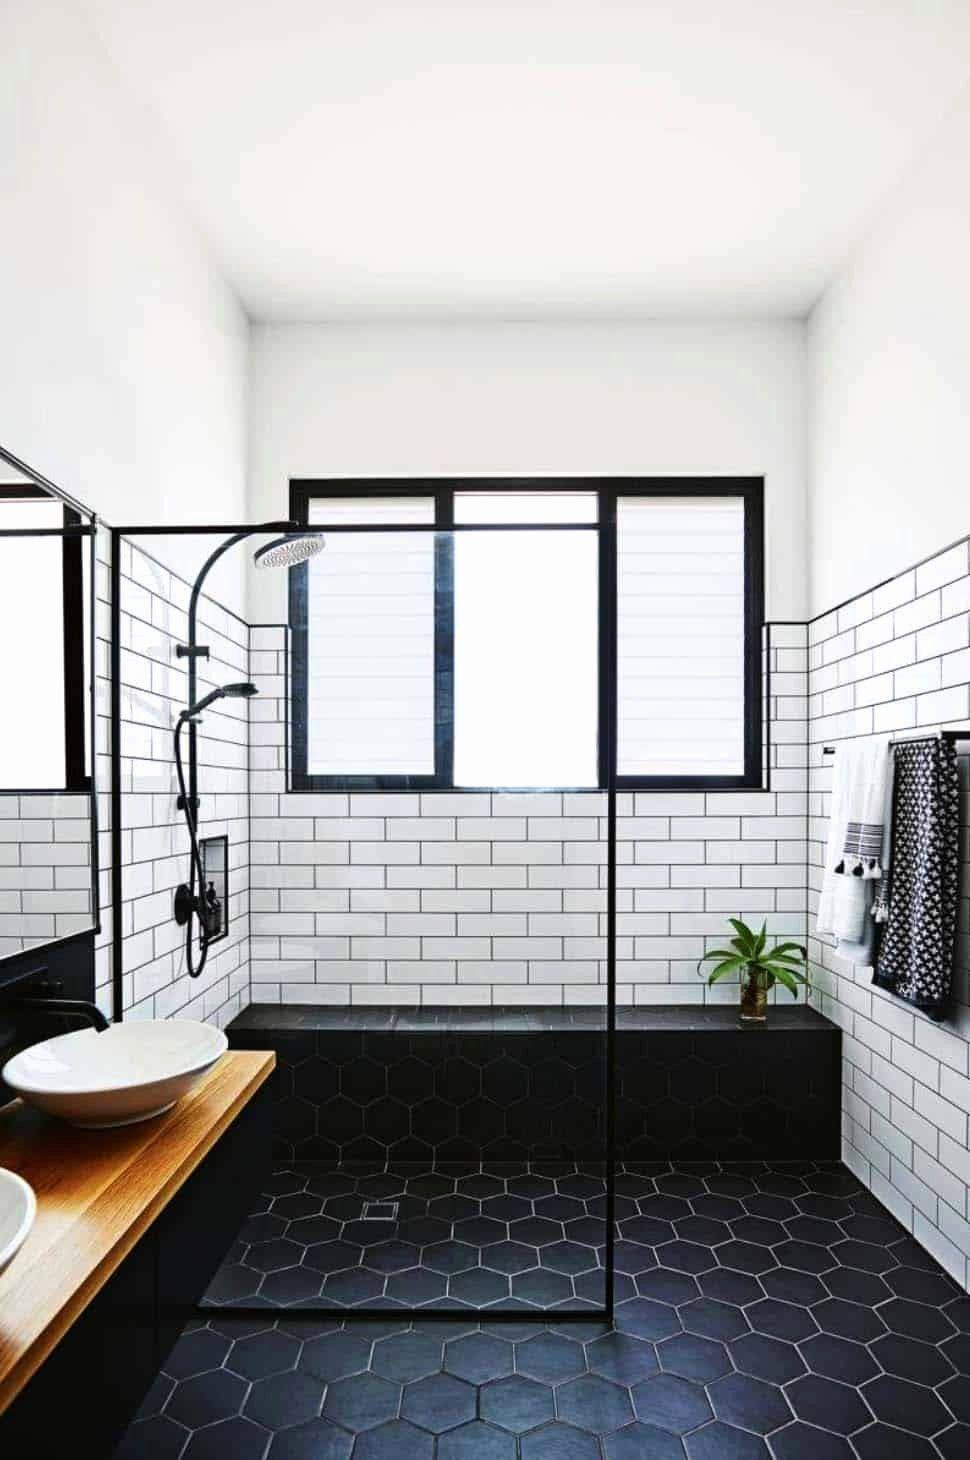 19 Black And White Bathroom Decor In 2020 Modern Bathroom Tile Bathroom Remodel Master Bathroom Design